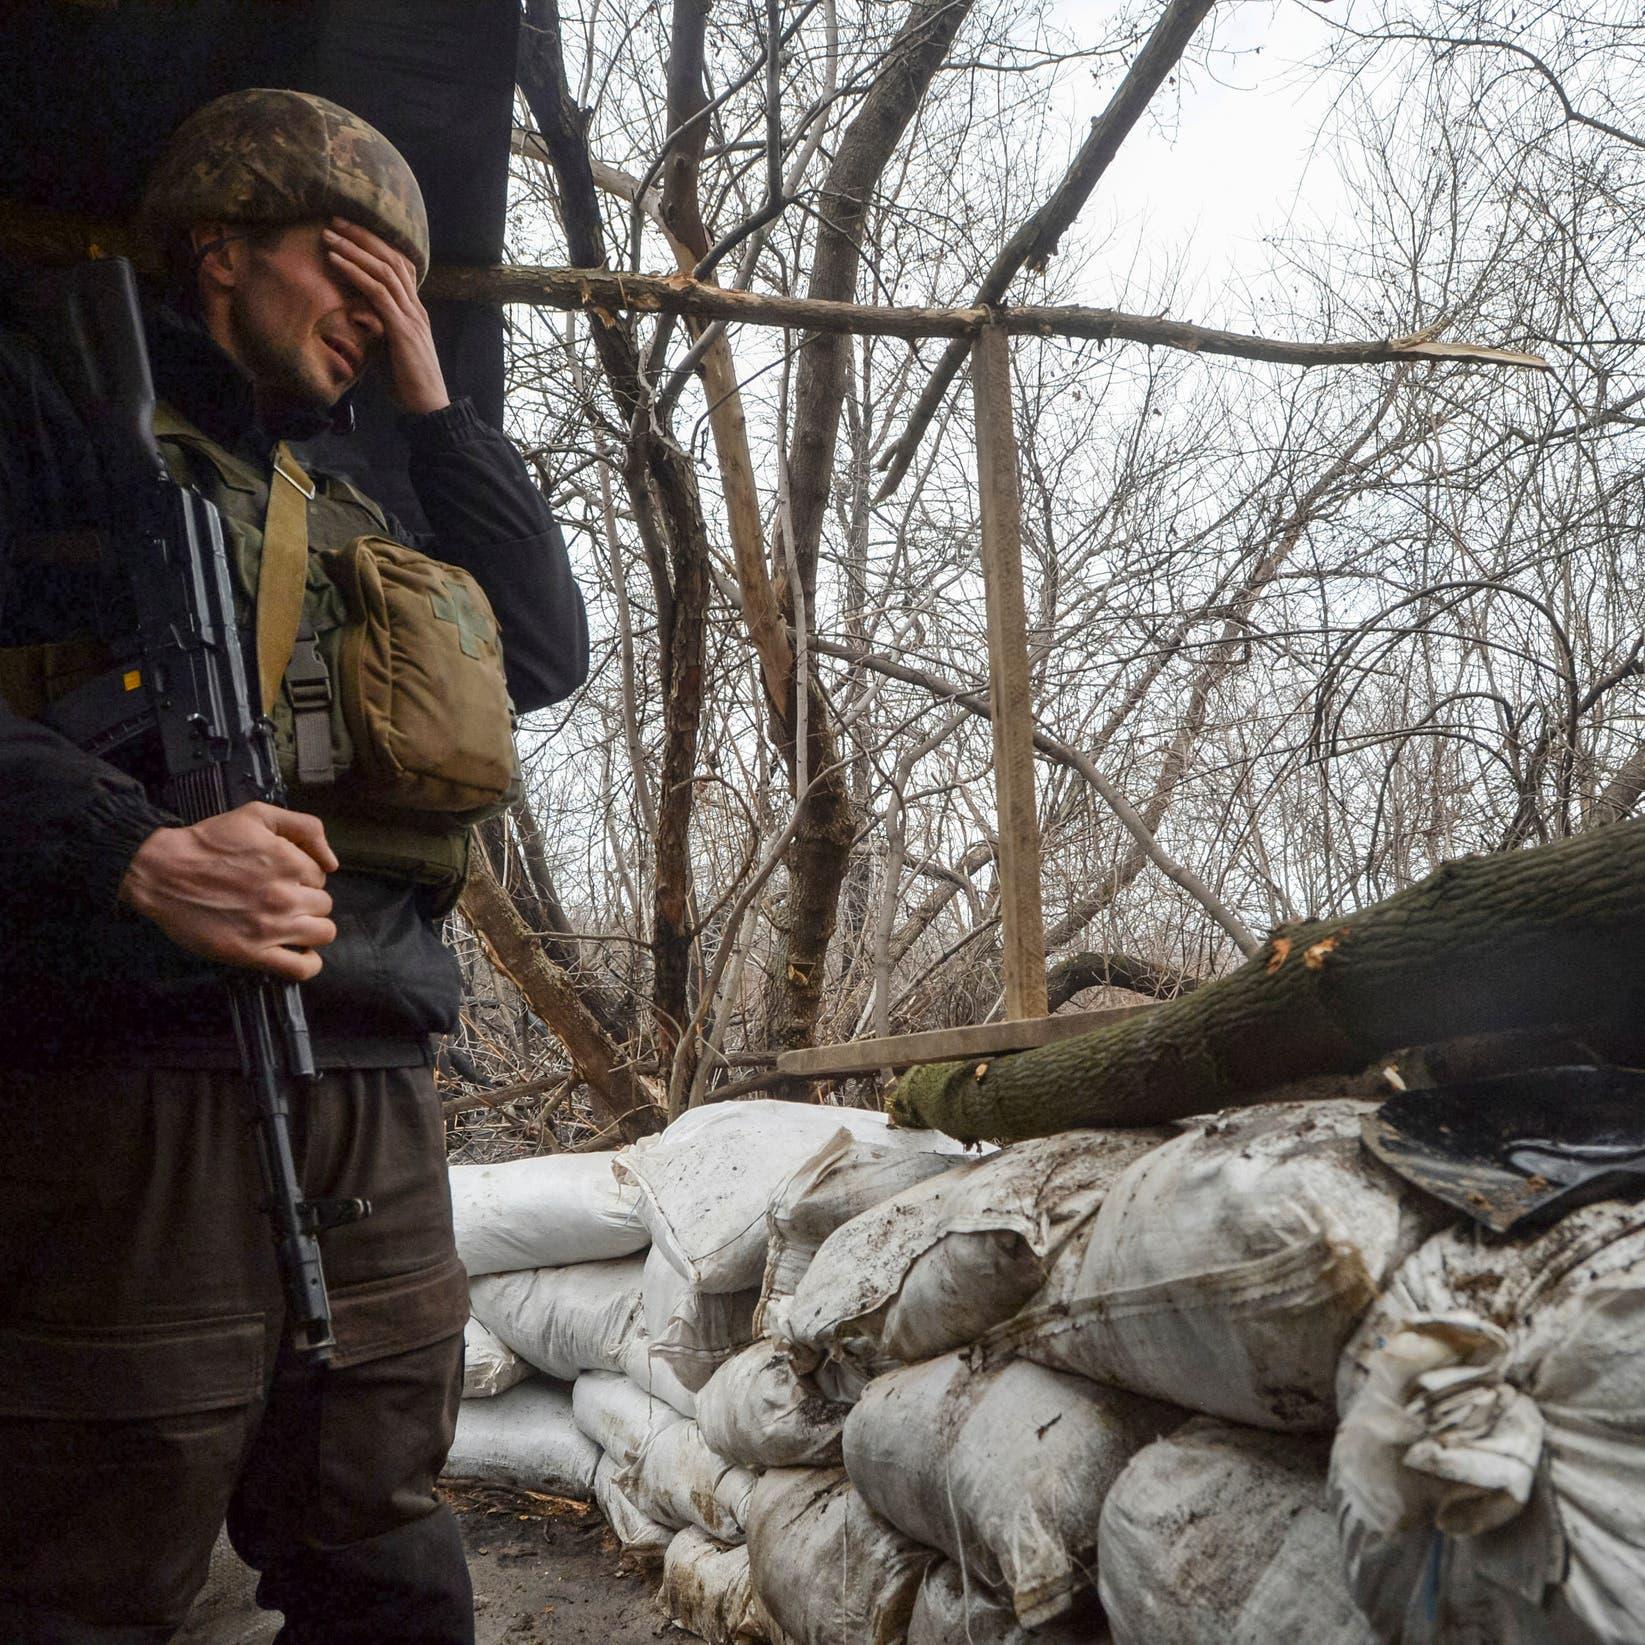 Over 150,000 Russian troops massed on Ukraine's border, Crimea: EU's Borrell